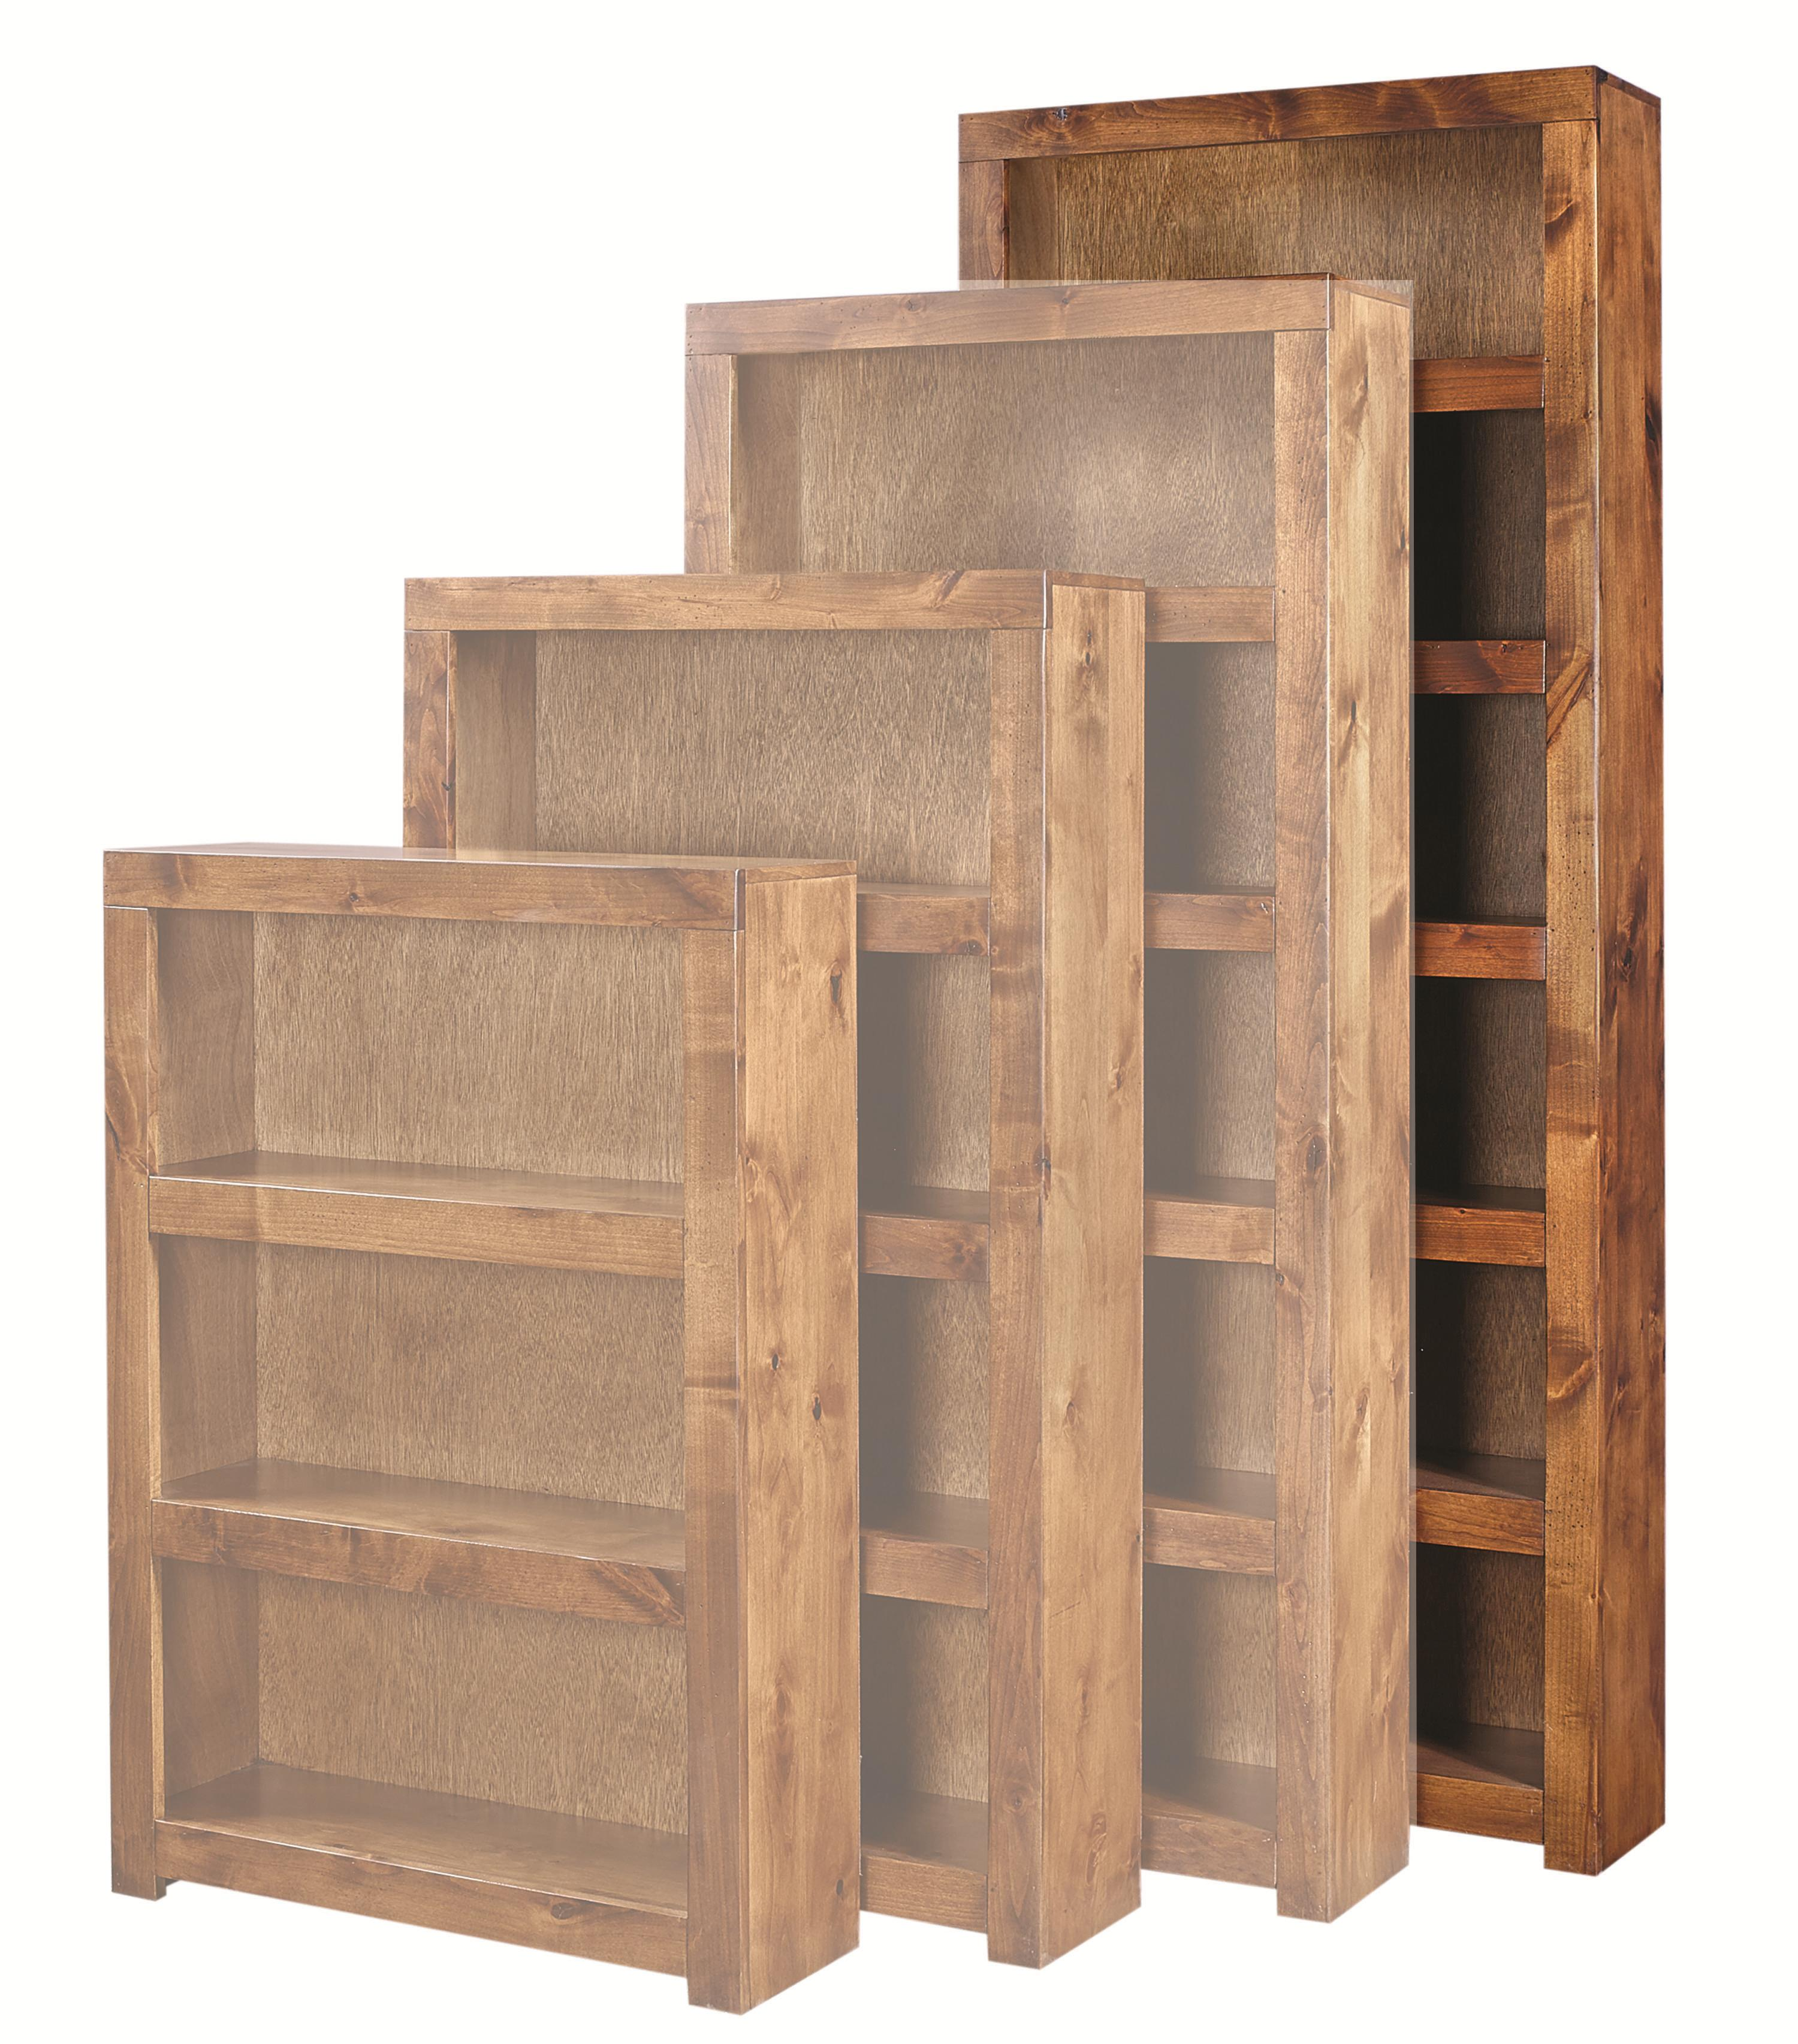 Contemporary Alder 84 Inch Bookcase by Aspenhome at Baer's Furniture